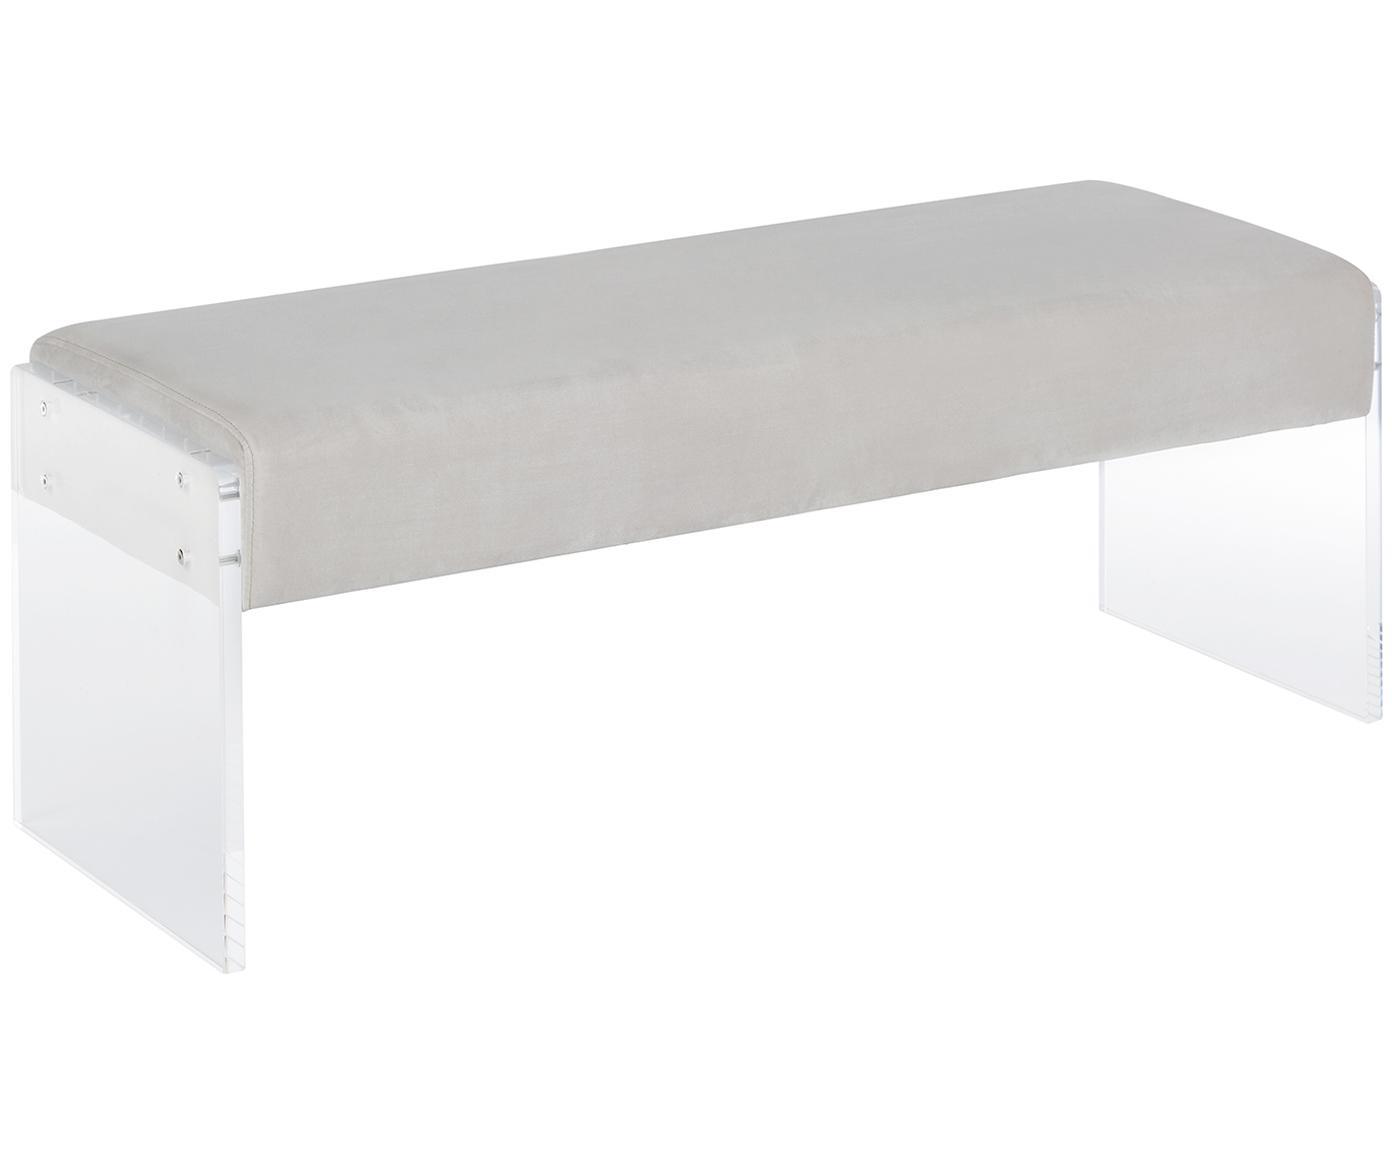 Fluwelen bank Ayden, Bekleding: fluweel (polyester), Frame: massief populierenhout, m, Poten: acrylglas, Bekleding: lichtgrijs. Frame: transparant, 116 x 43 cm